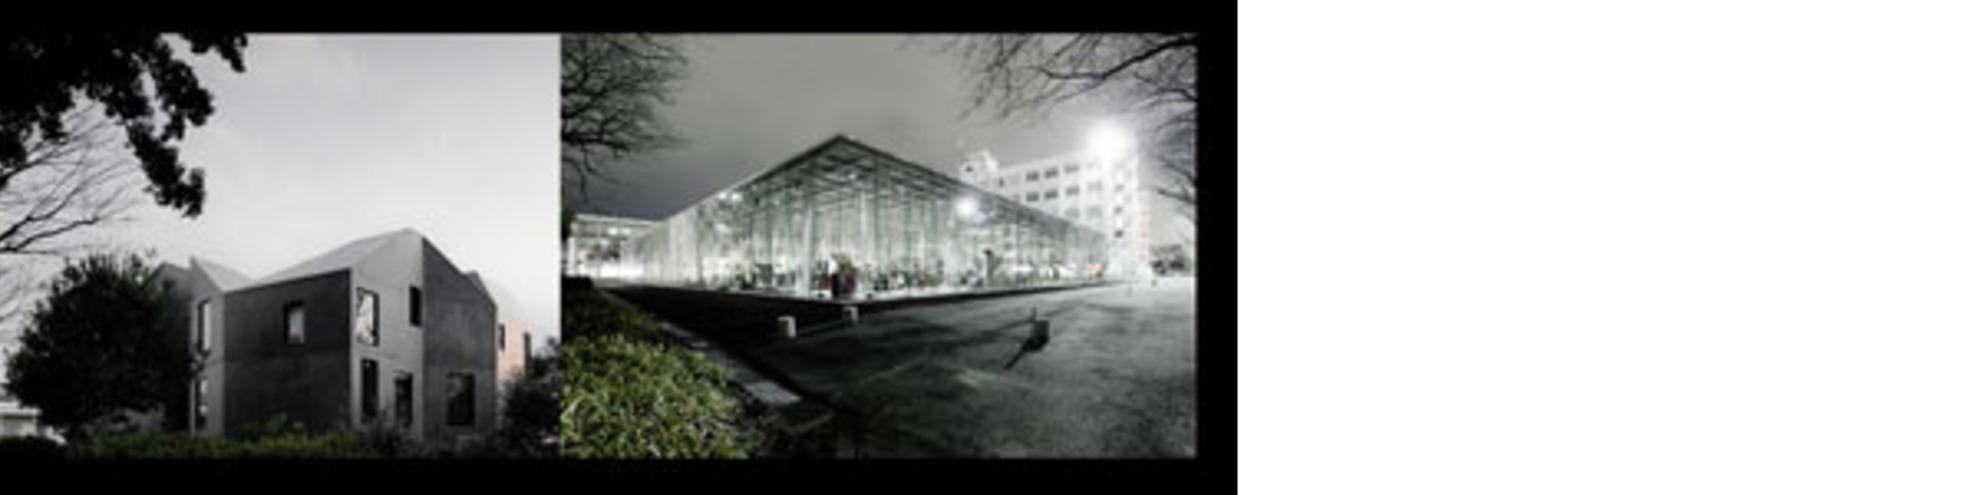 Spaziofmg e l 39 architettura giapponese floornature for Architettura giapponese